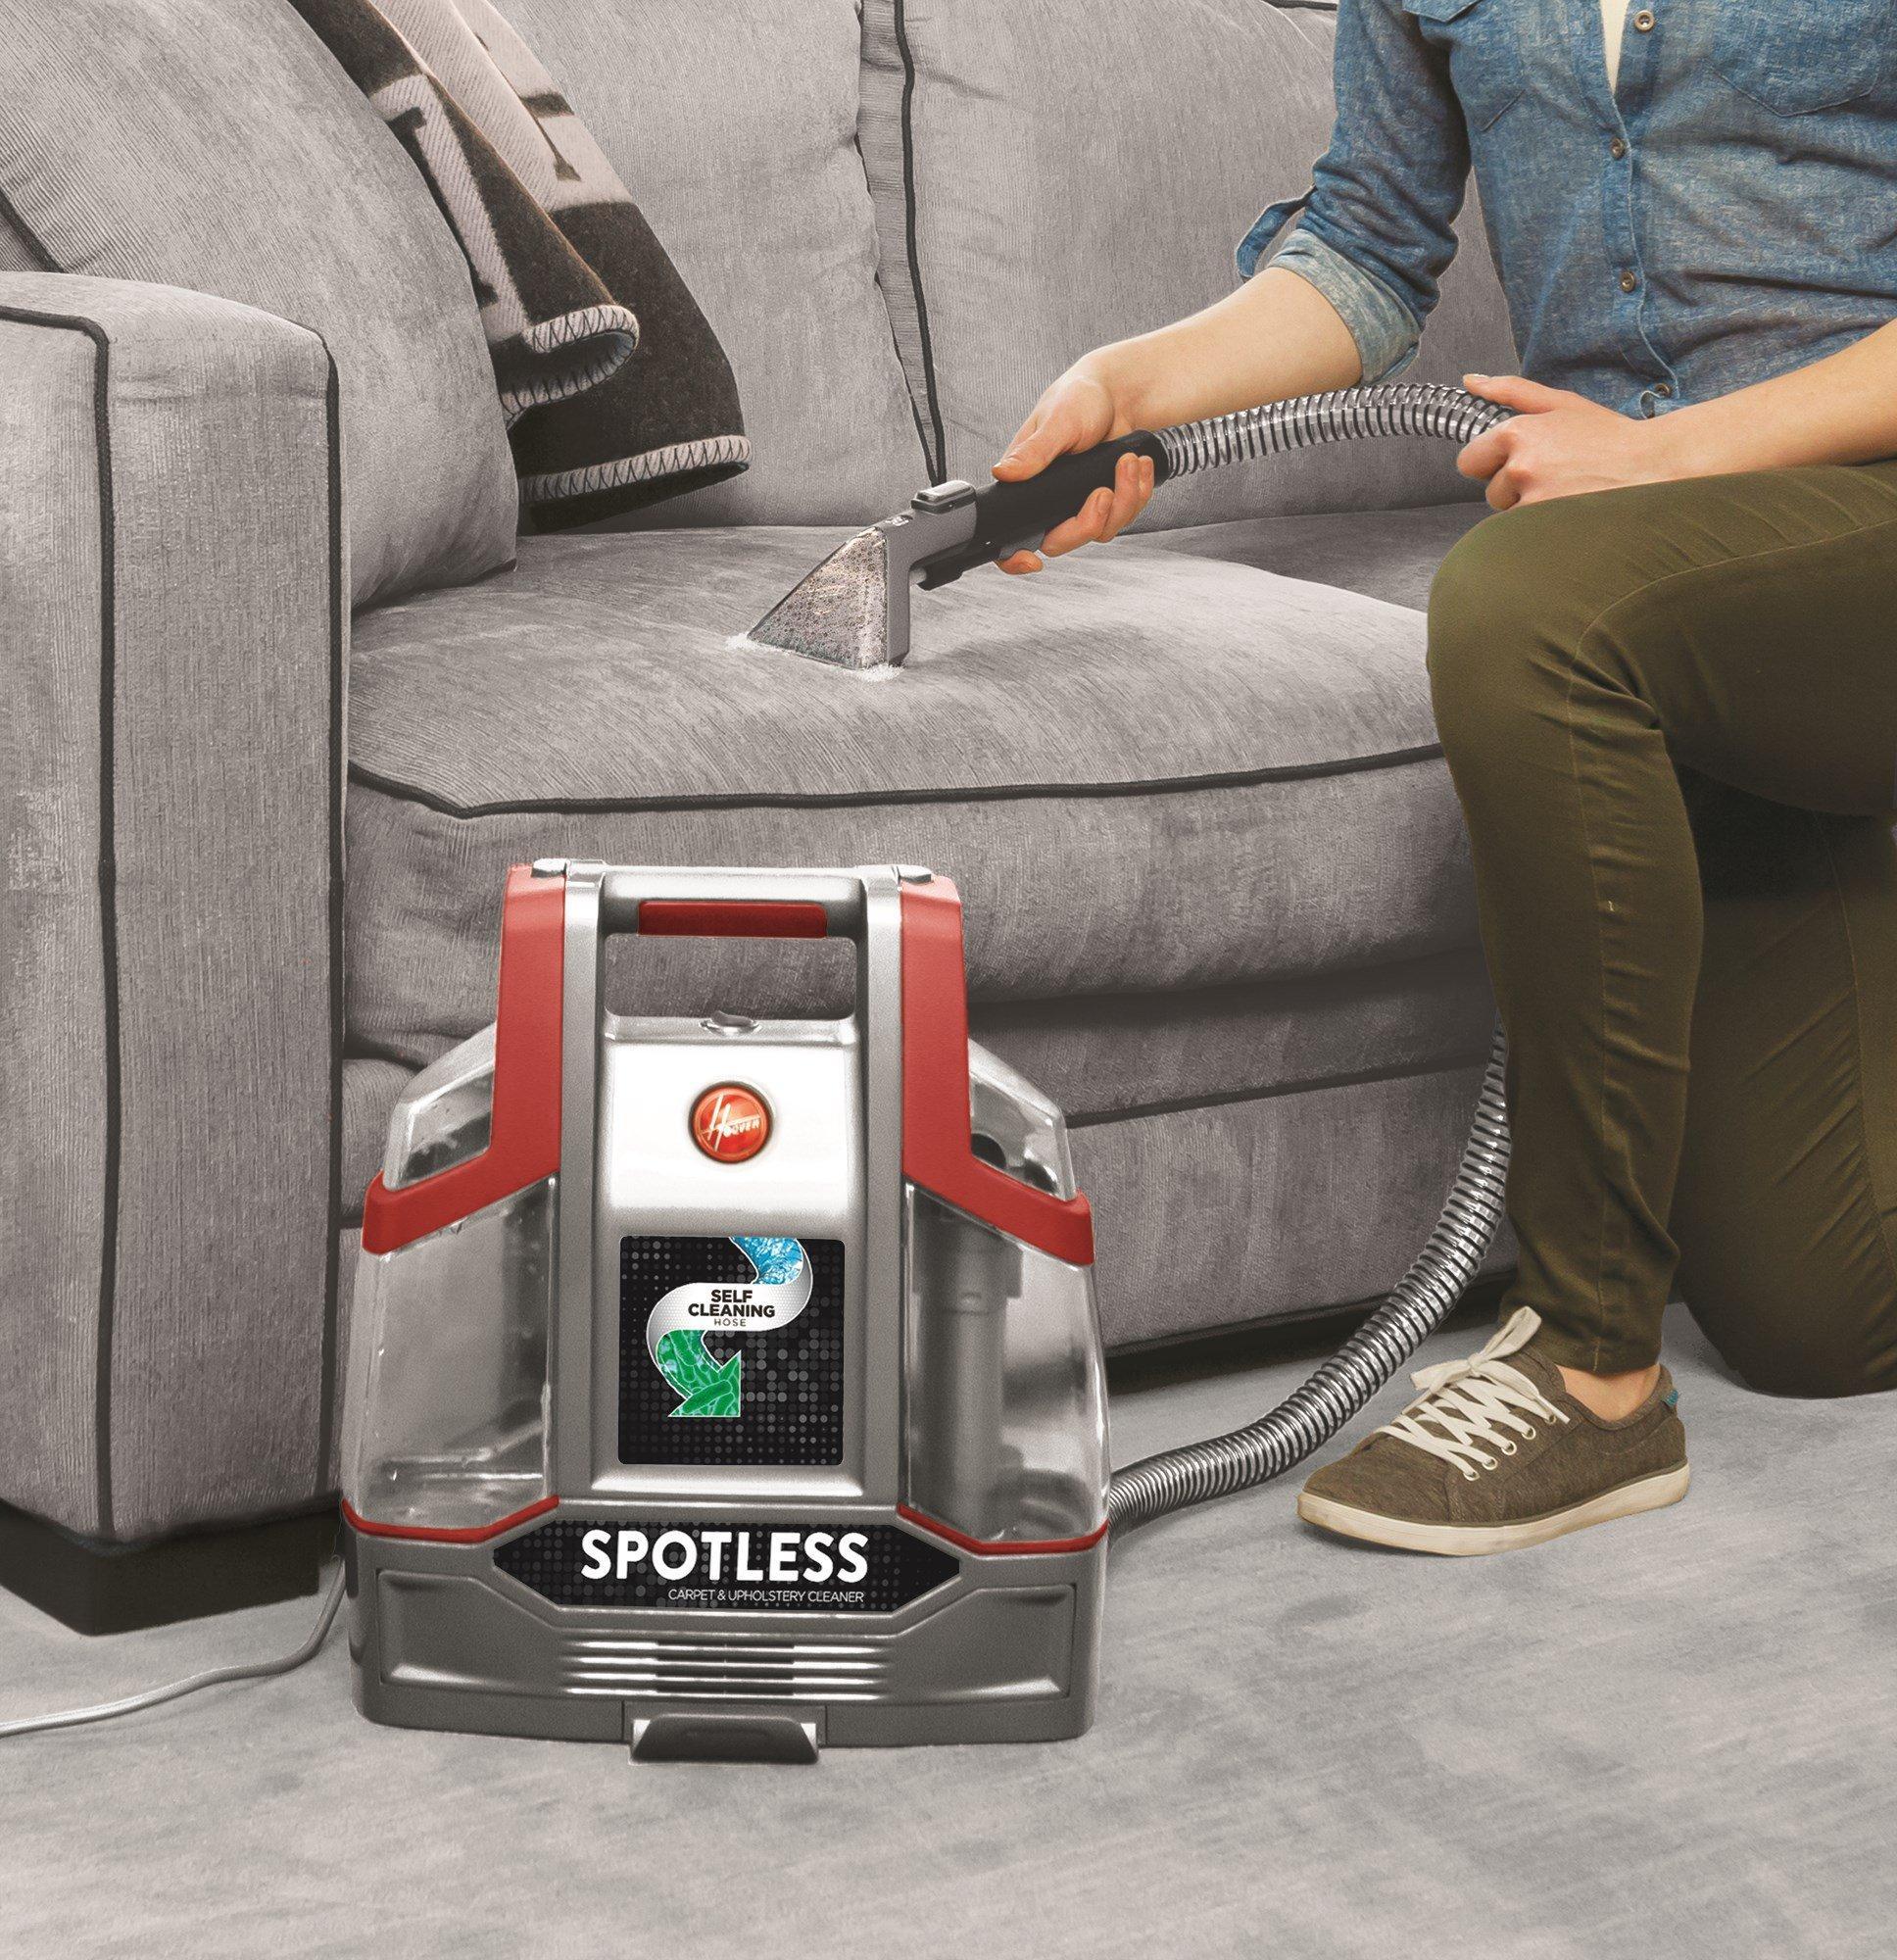 Spotless Pet Portable Carpet & Upholstery Cleaner3